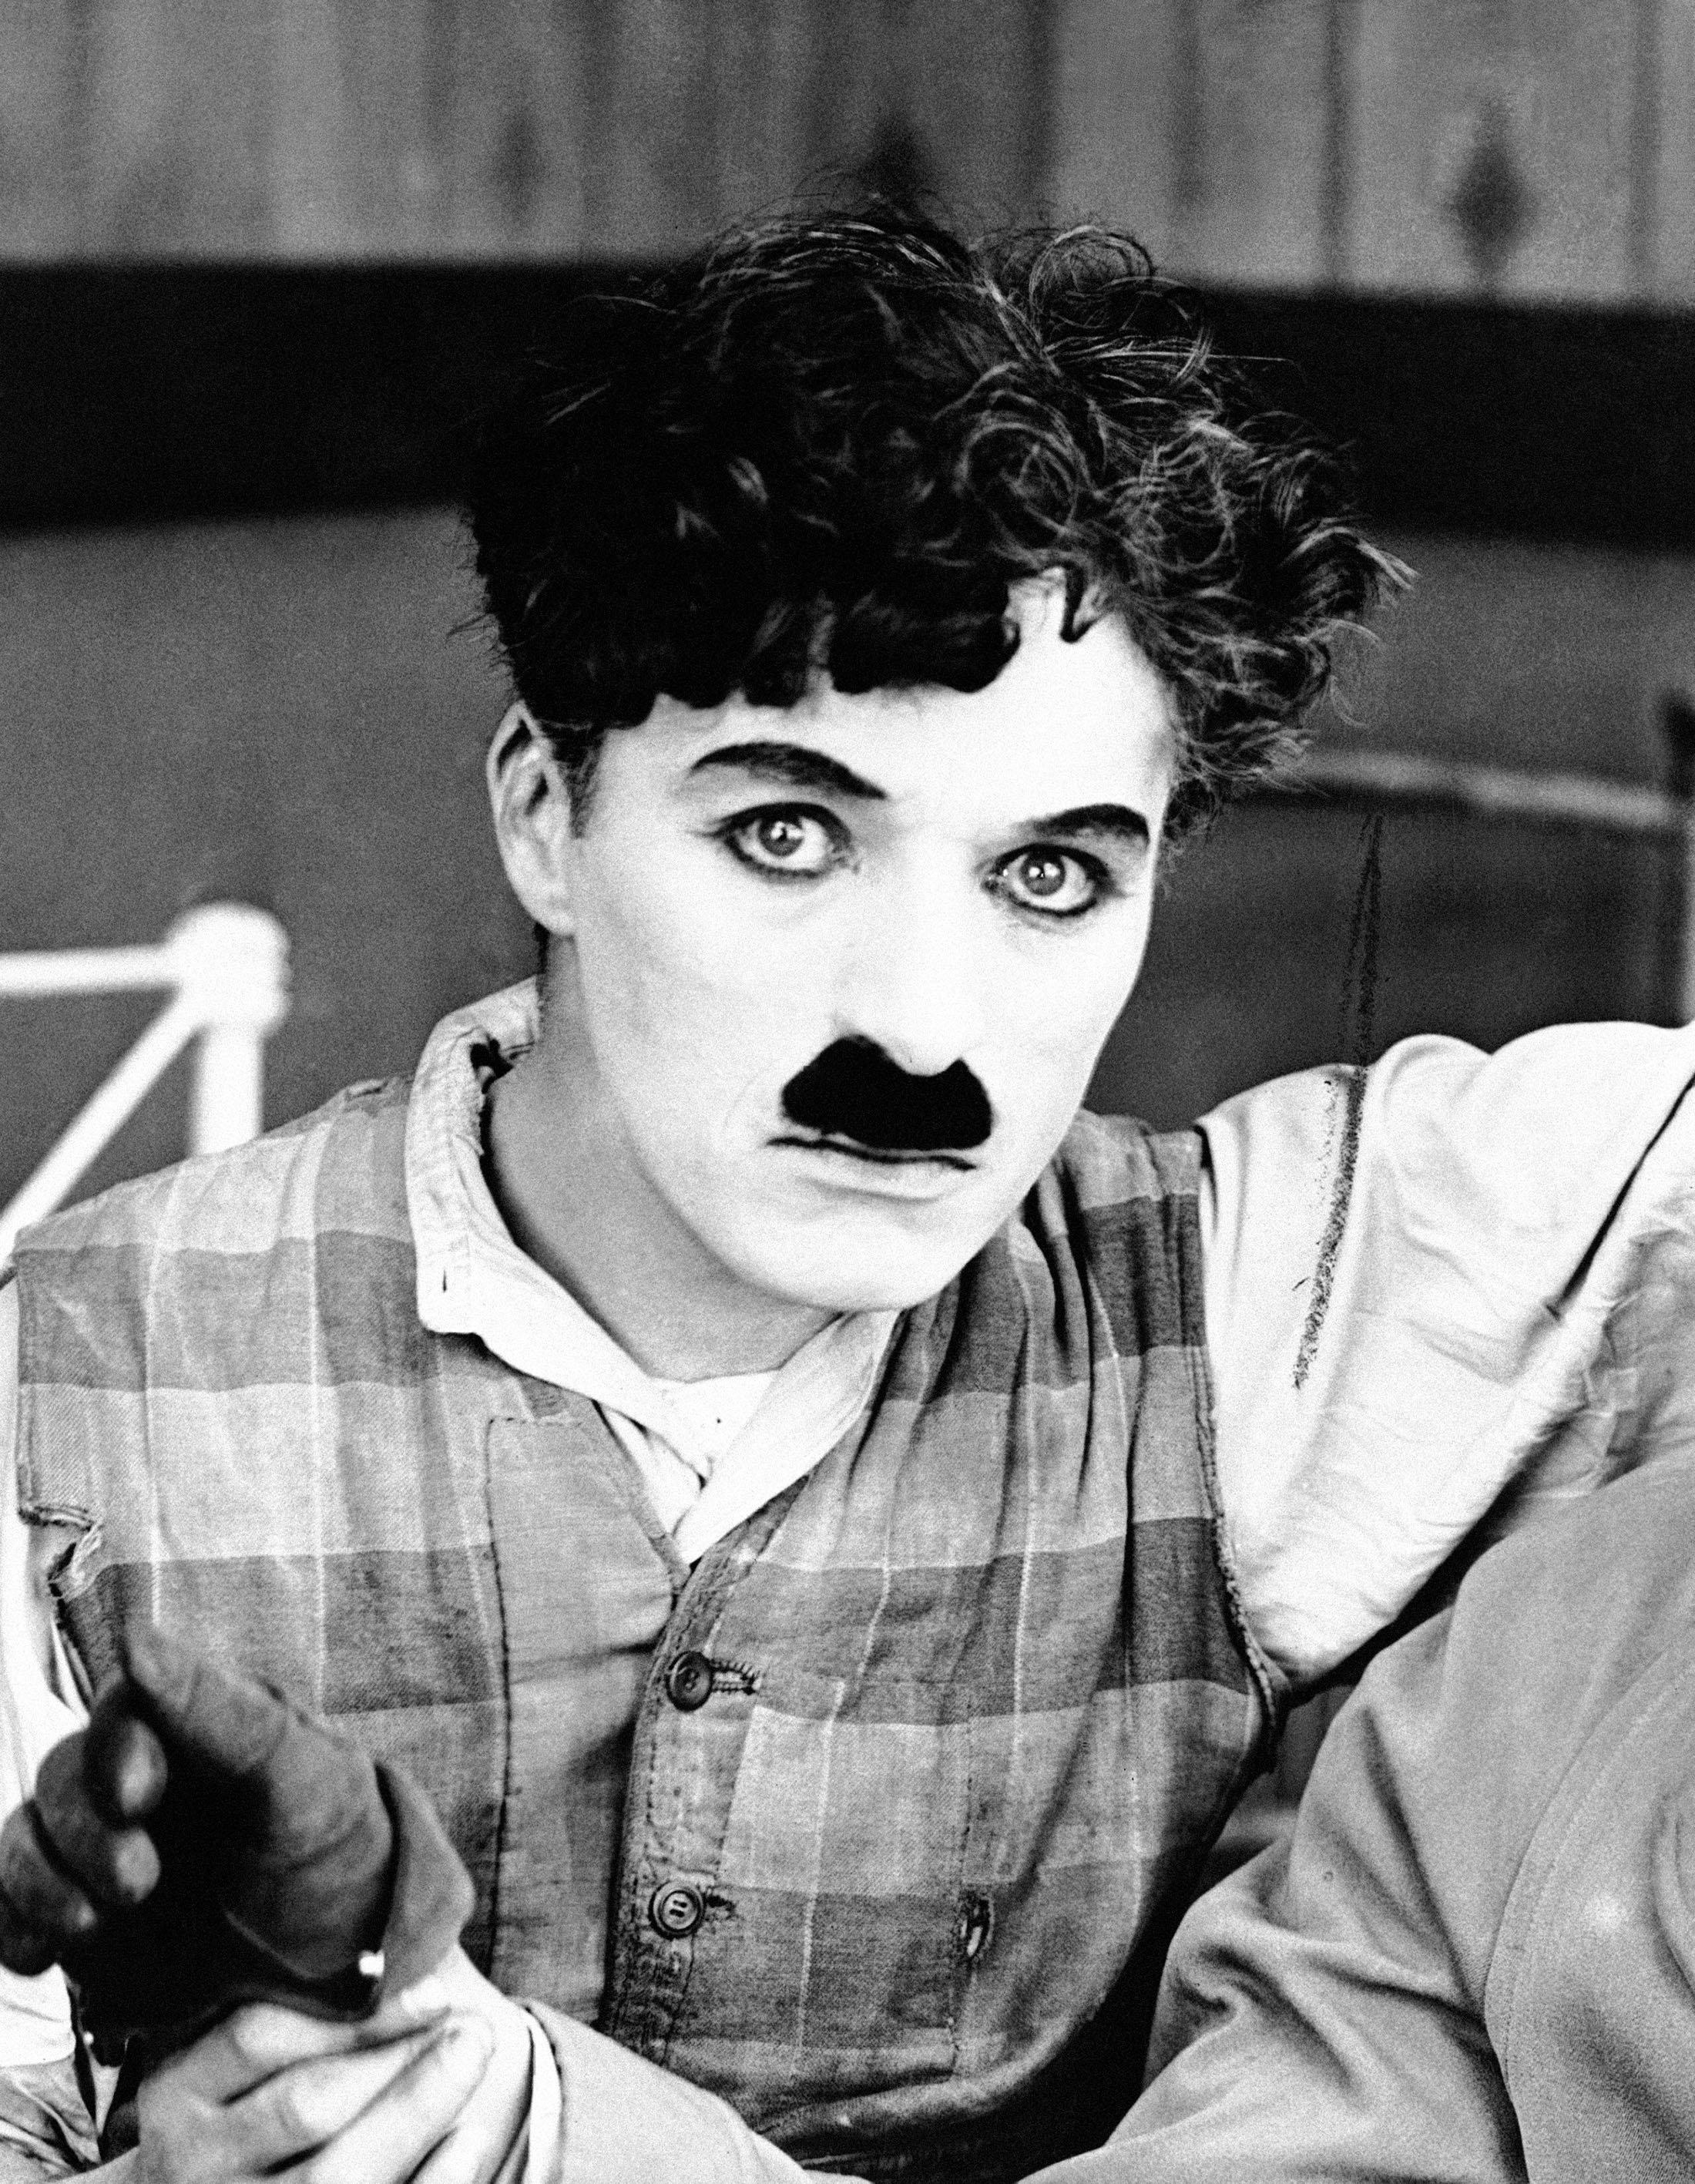 Charlie Chaplin in an undated photo. (AP Photo)